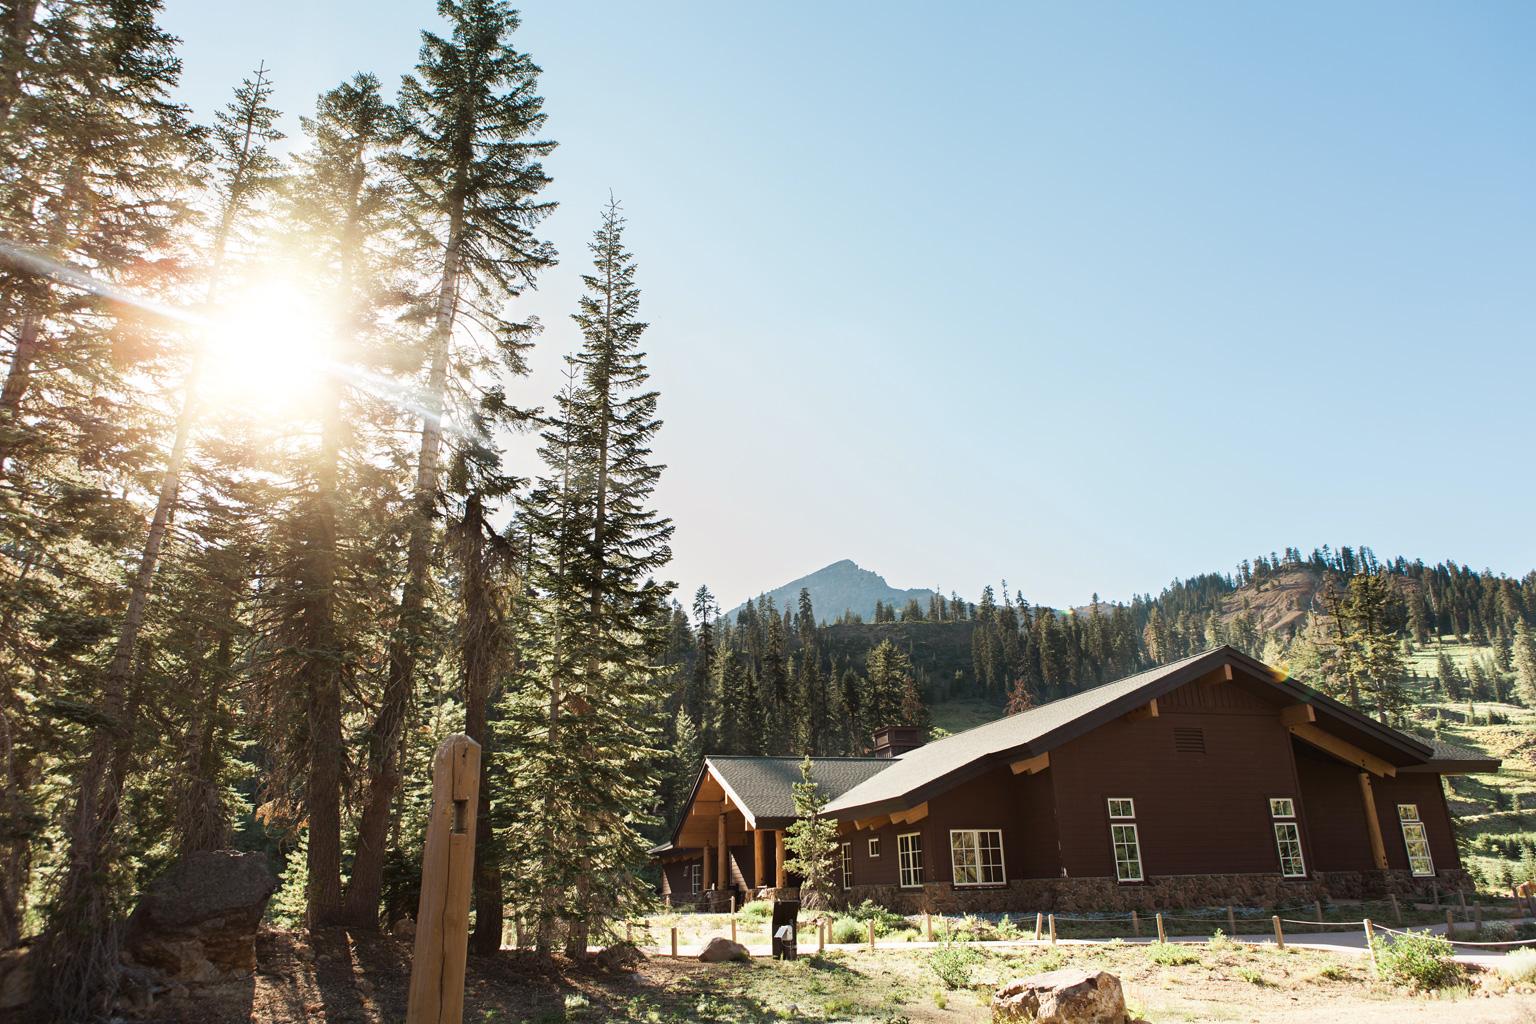 CindyGiovagnoli_Lassen_Volcanic_National_Park_California_camp_road_trip-001.jpg